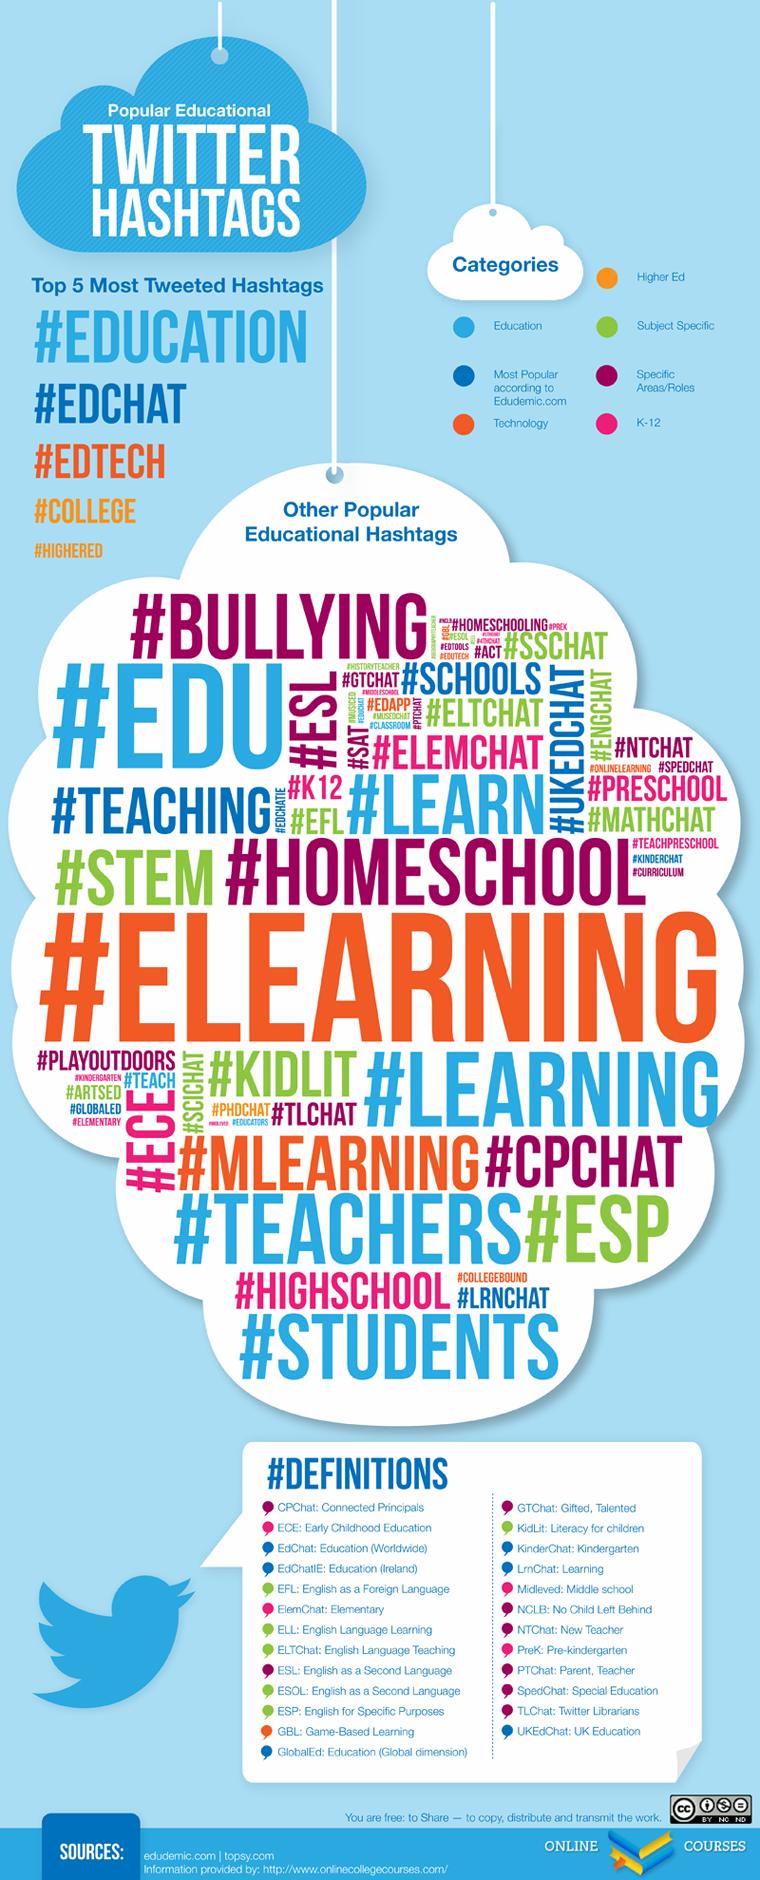 popular-educational-twitter-hashtags-760